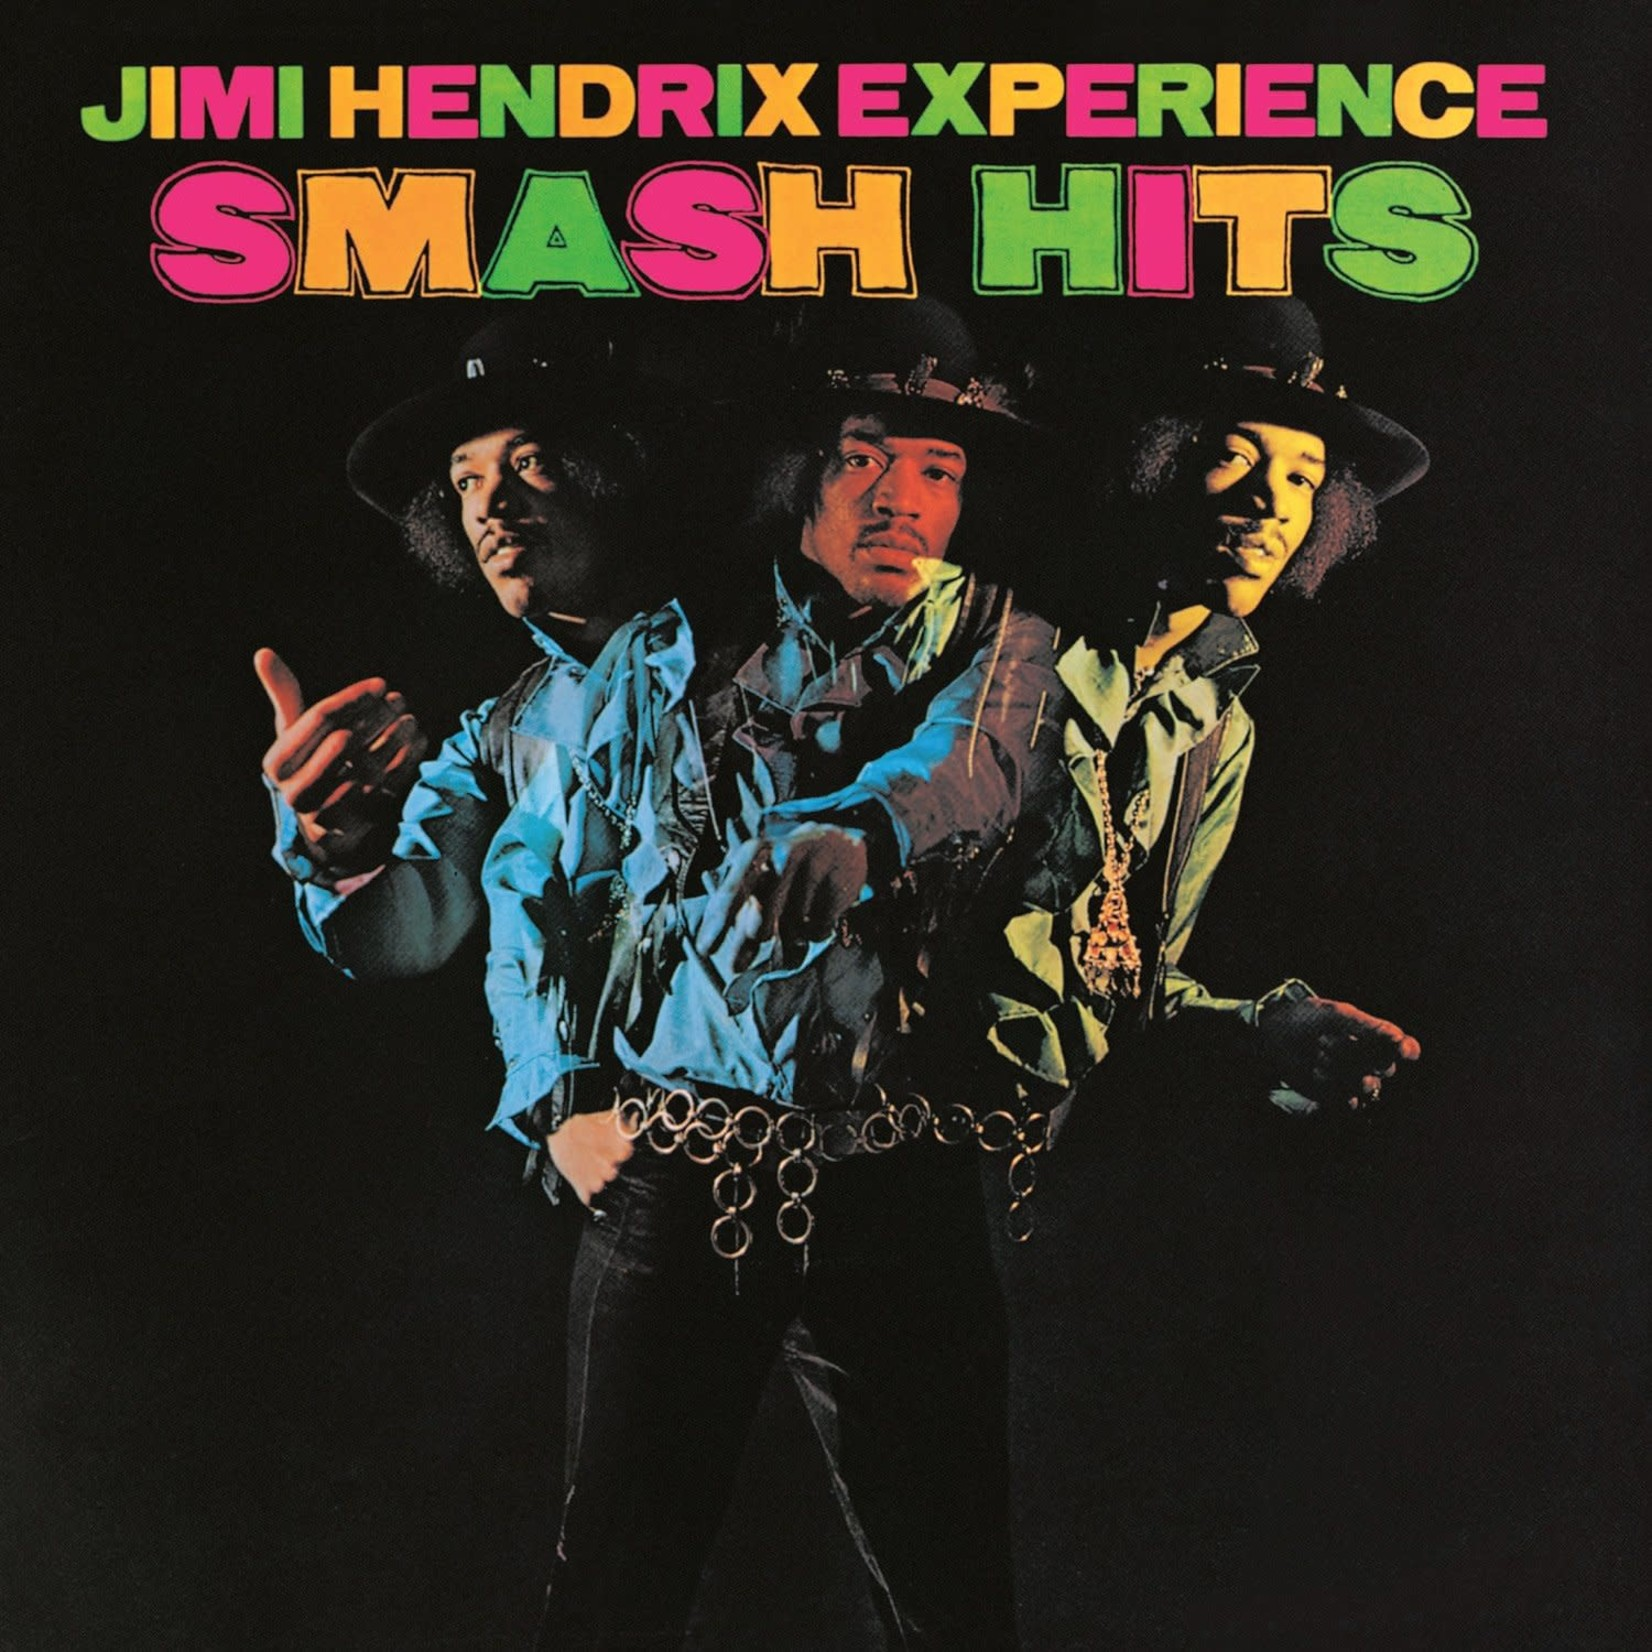 [Vintage] Hendrix, Jimi: Smash Hits (reissue, no poster)